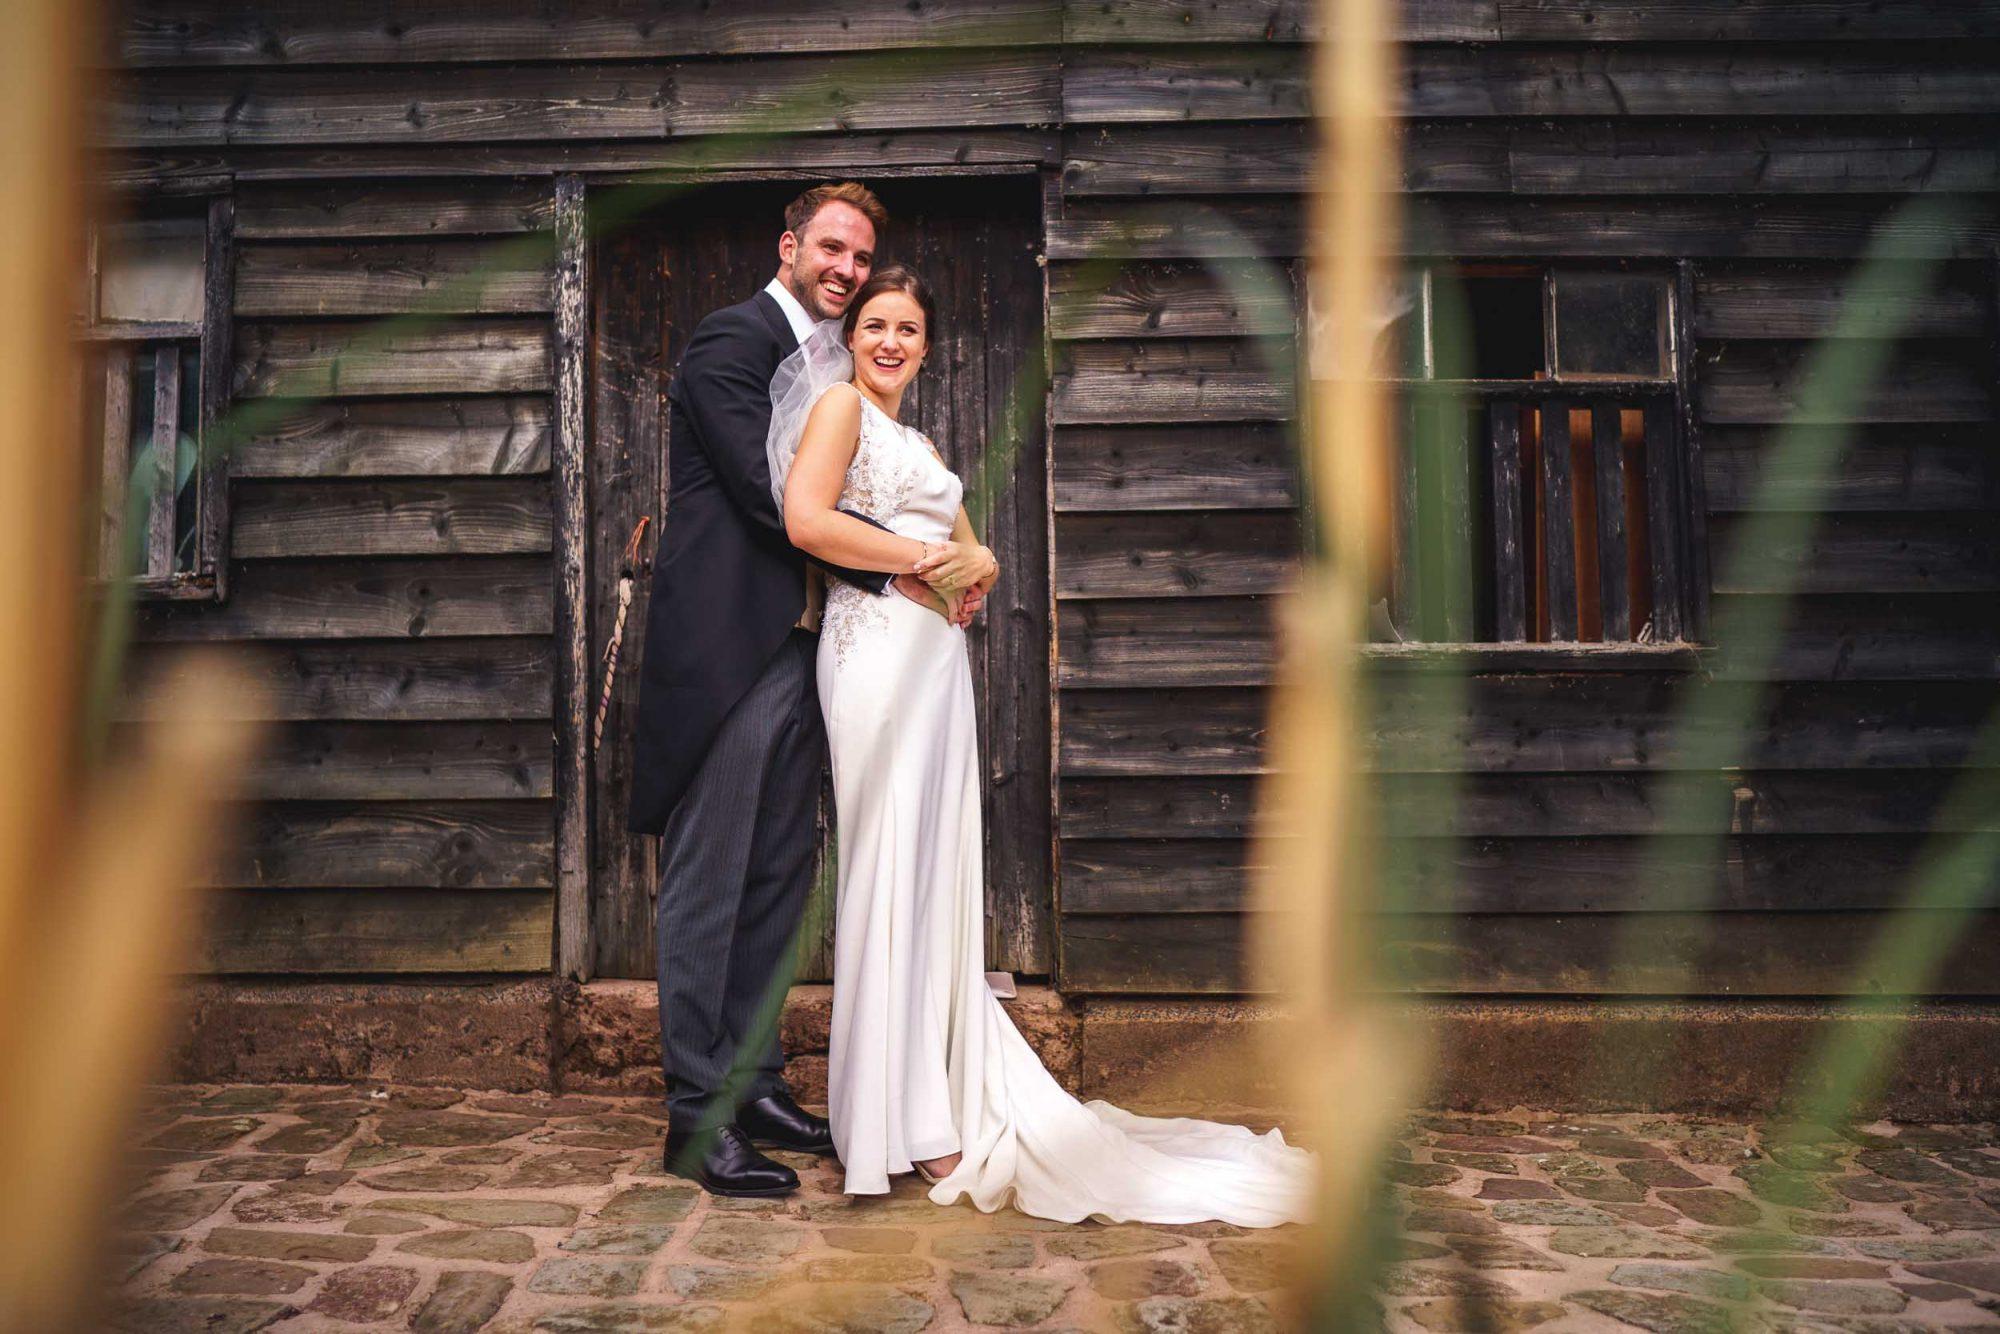 Wedding photographers in Herefordshire, Herefordshire Wedding, Wedding Photographer, Farm house Wedding, Marquee Wedding in Herefordshire,